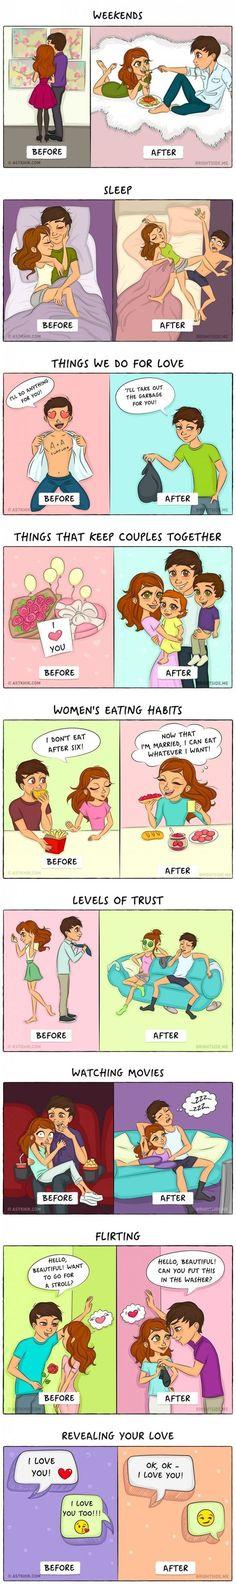 Dating Vs Marriage #lol #haha #funny http://ibeebz.com